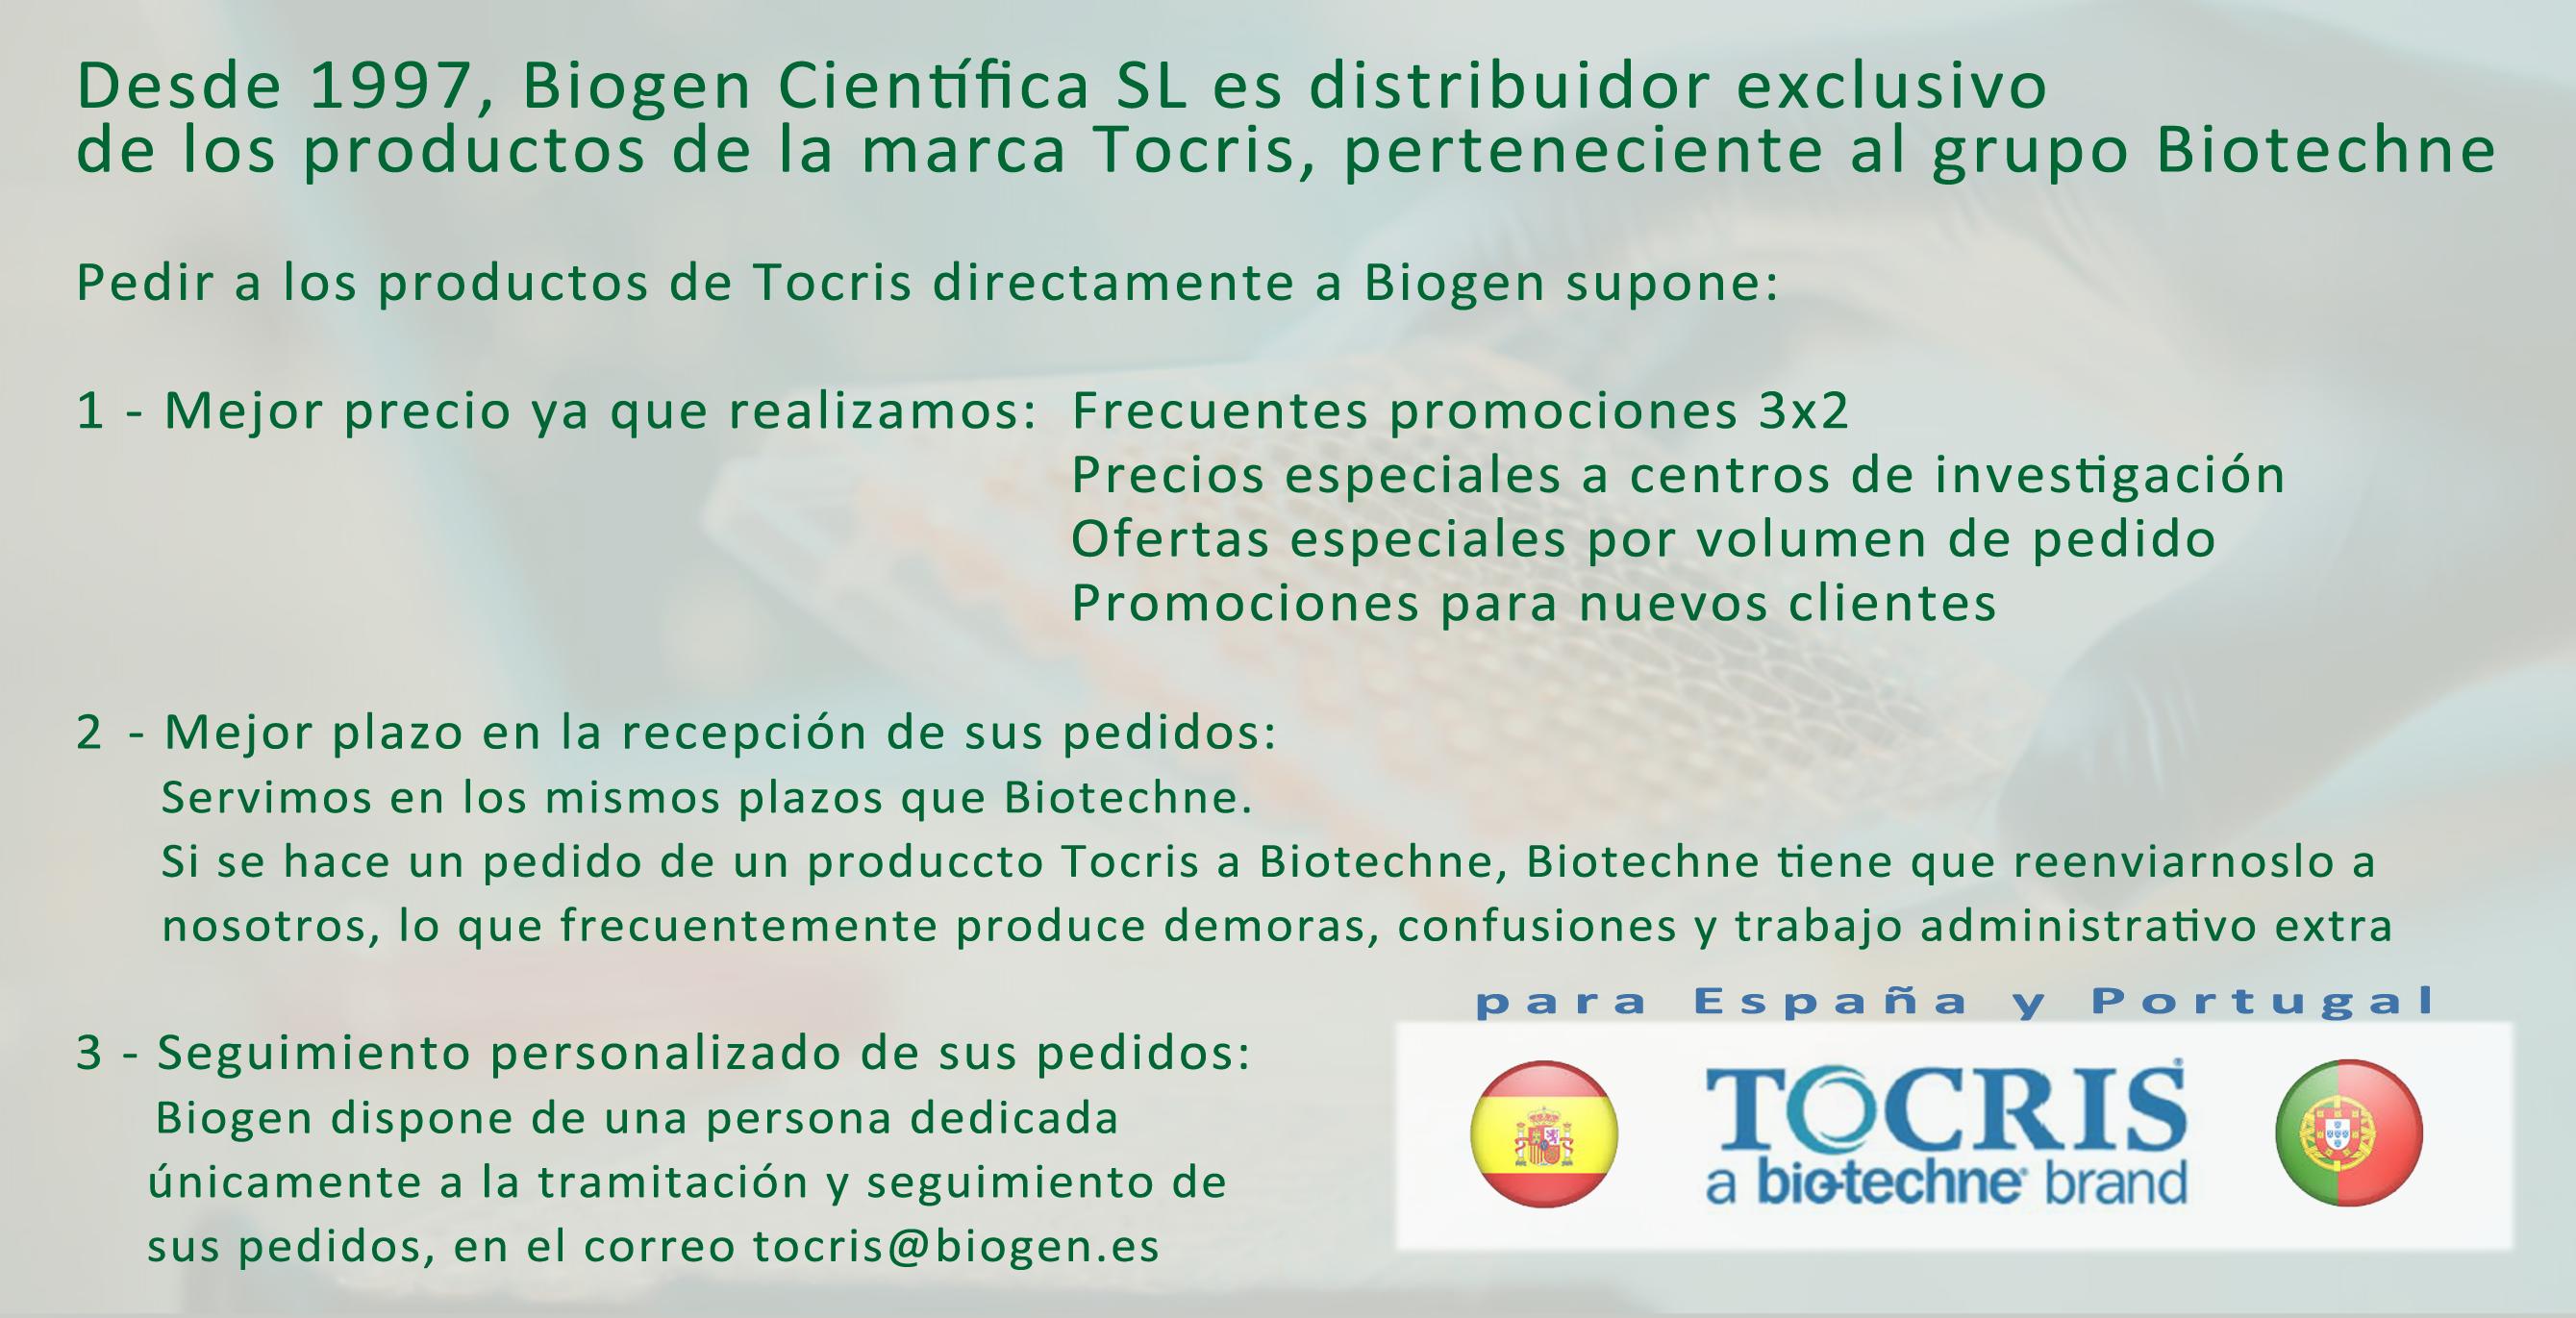 BIOGEN Distribuidor Exclusivo Tocris